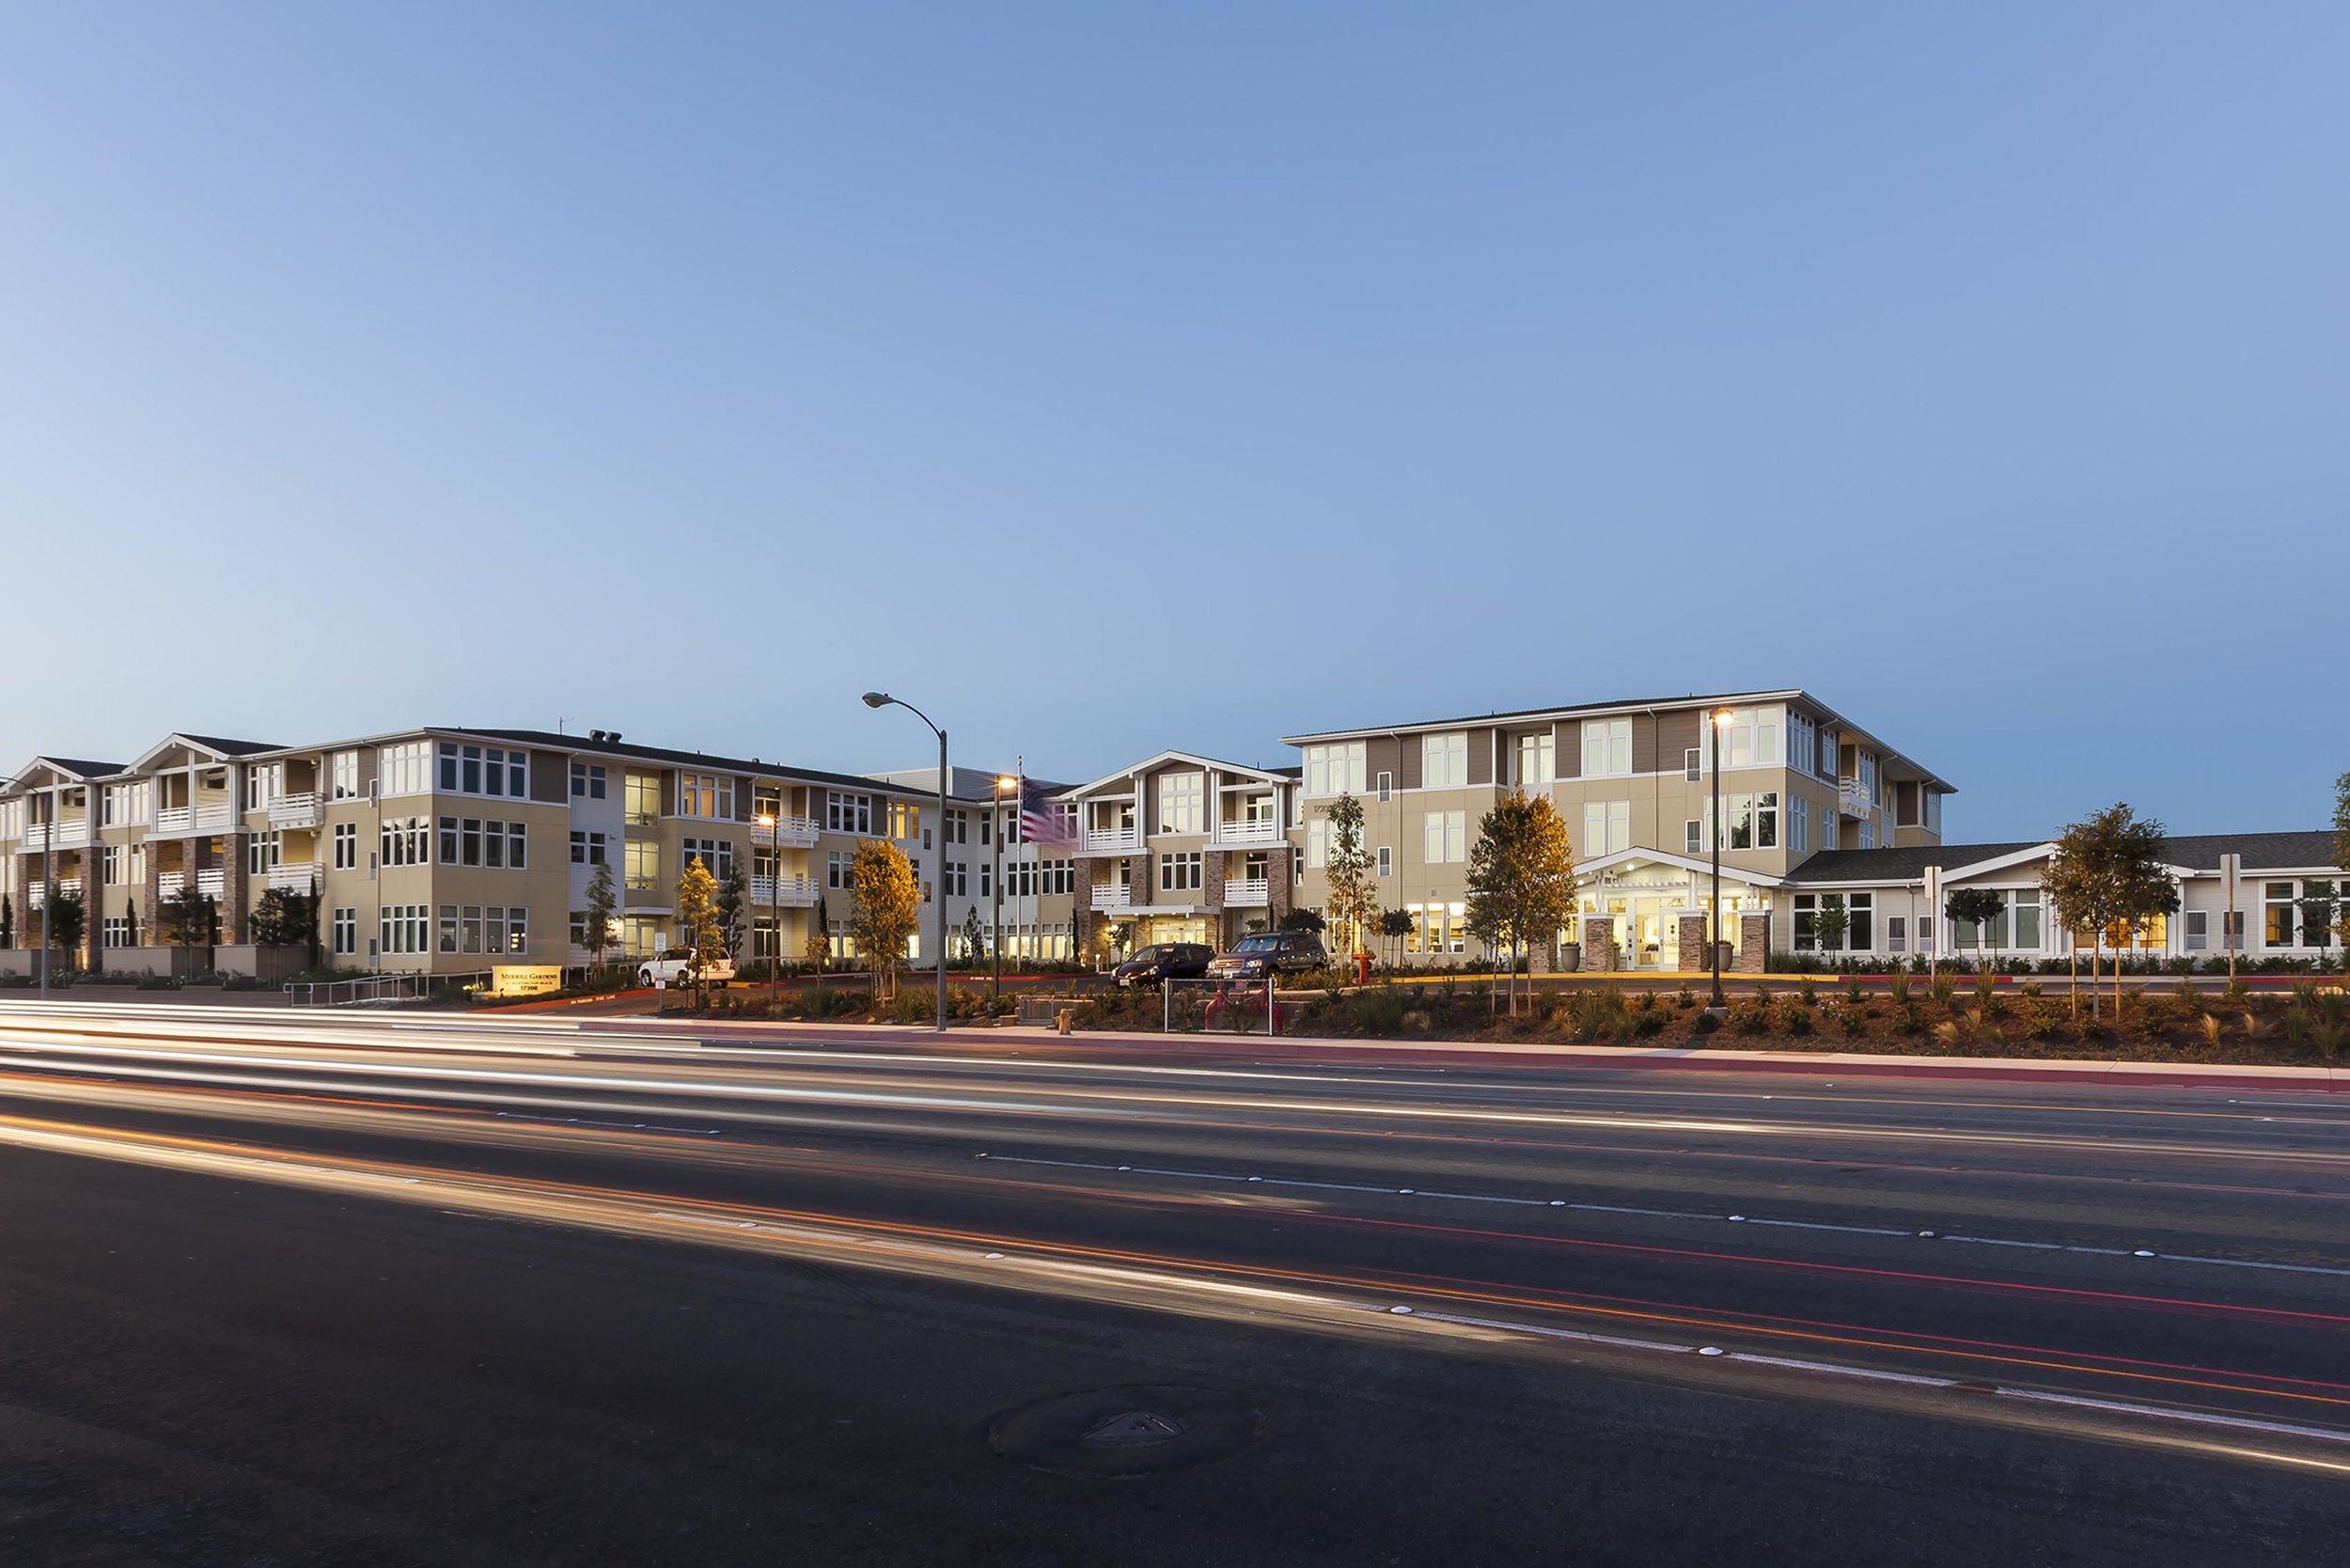 MERRILL GARDENS - HUNTINGTON BEACH, CALIFORNIA